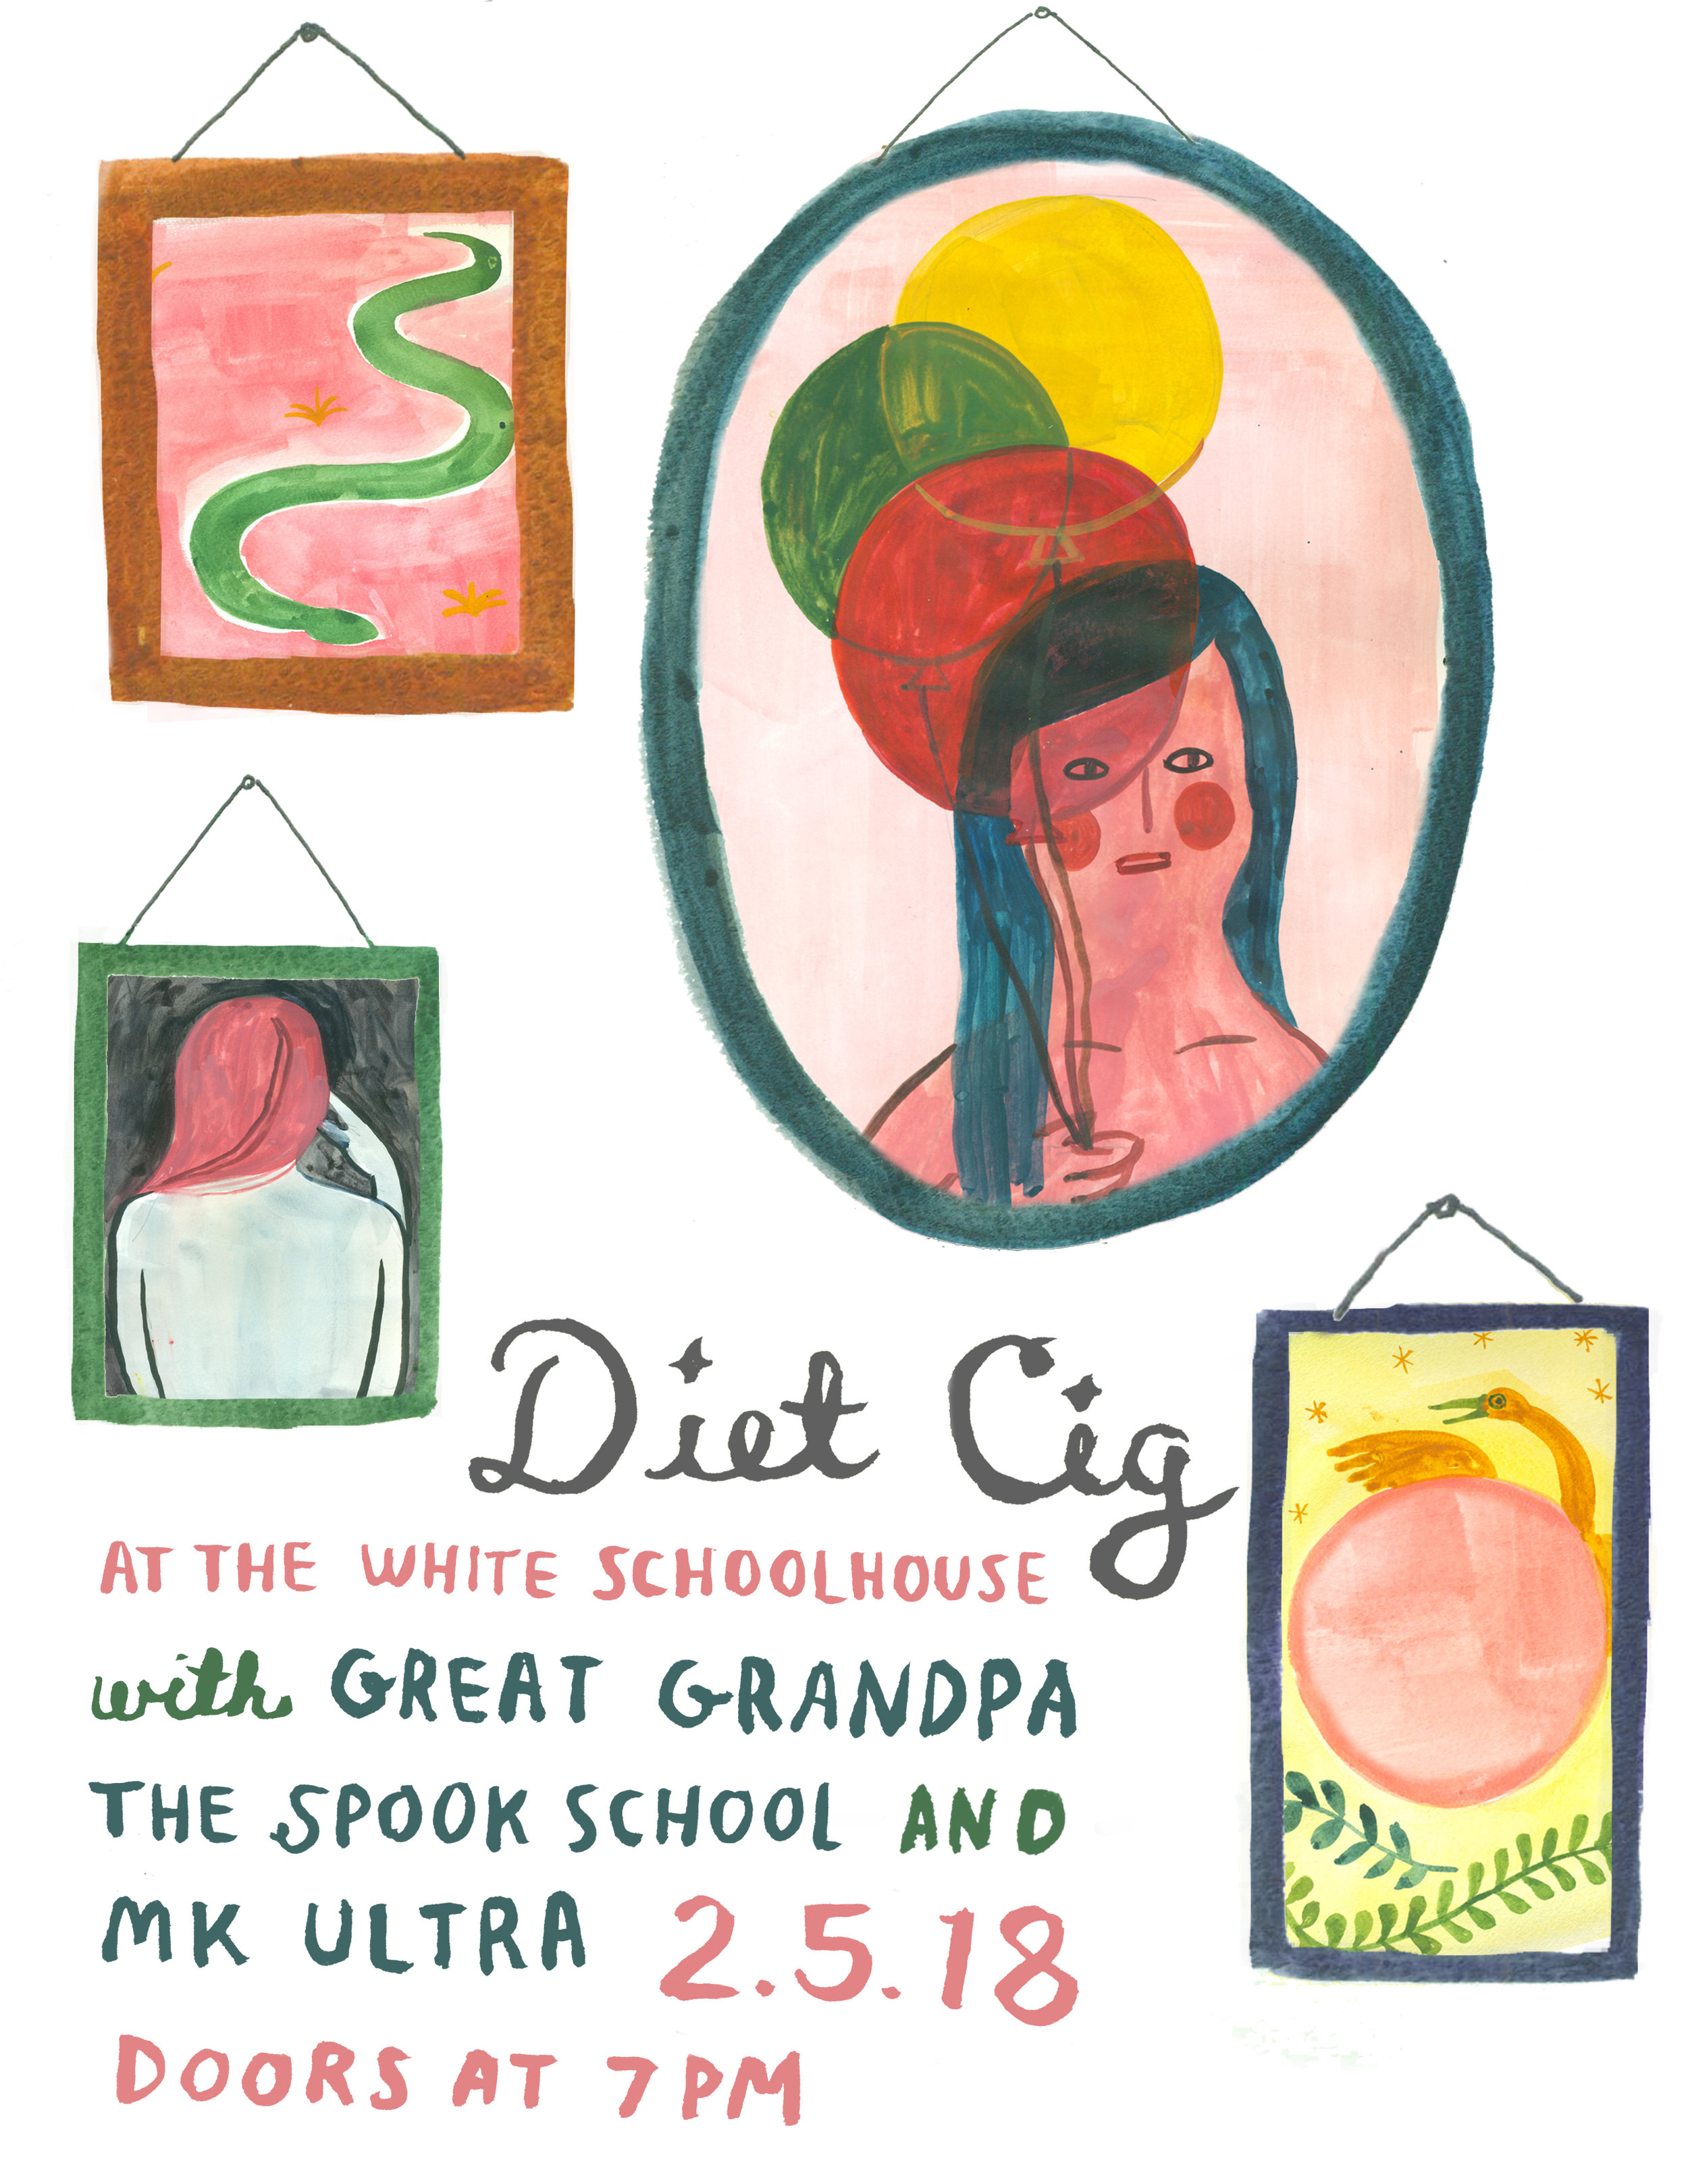 Diet Cig • 2.5.18 • White Schoolhouse